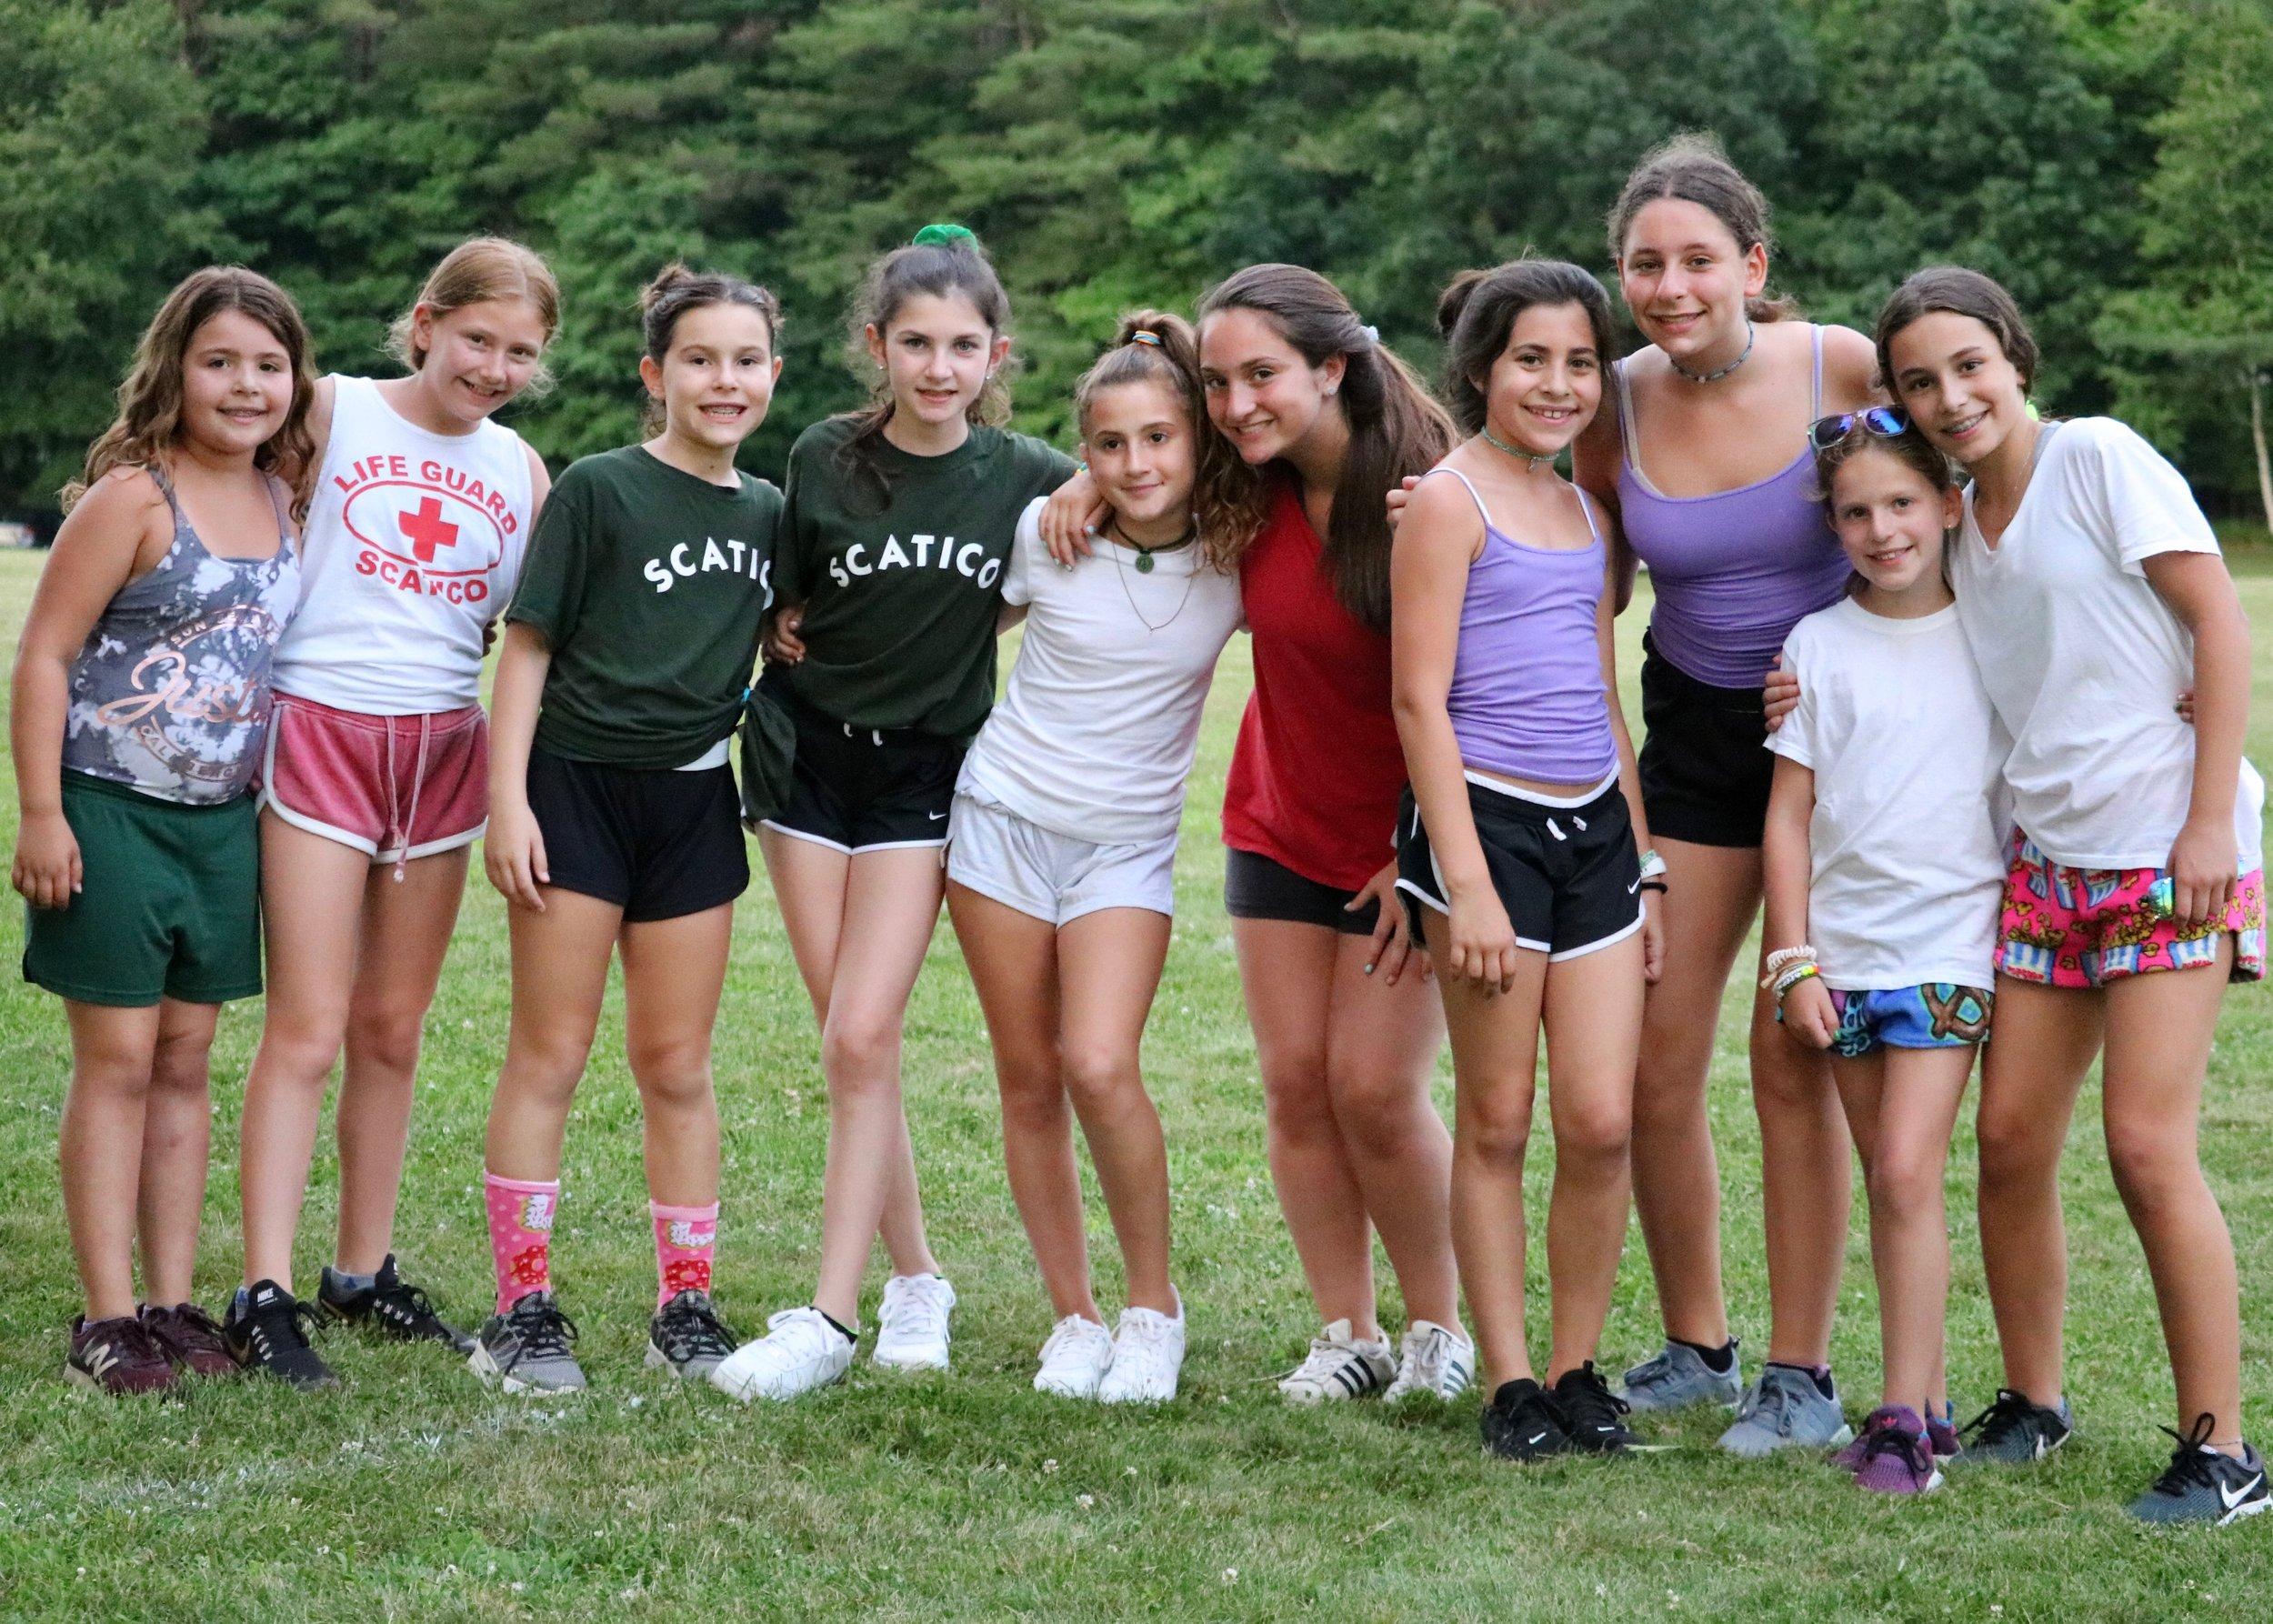 Camp sisters!